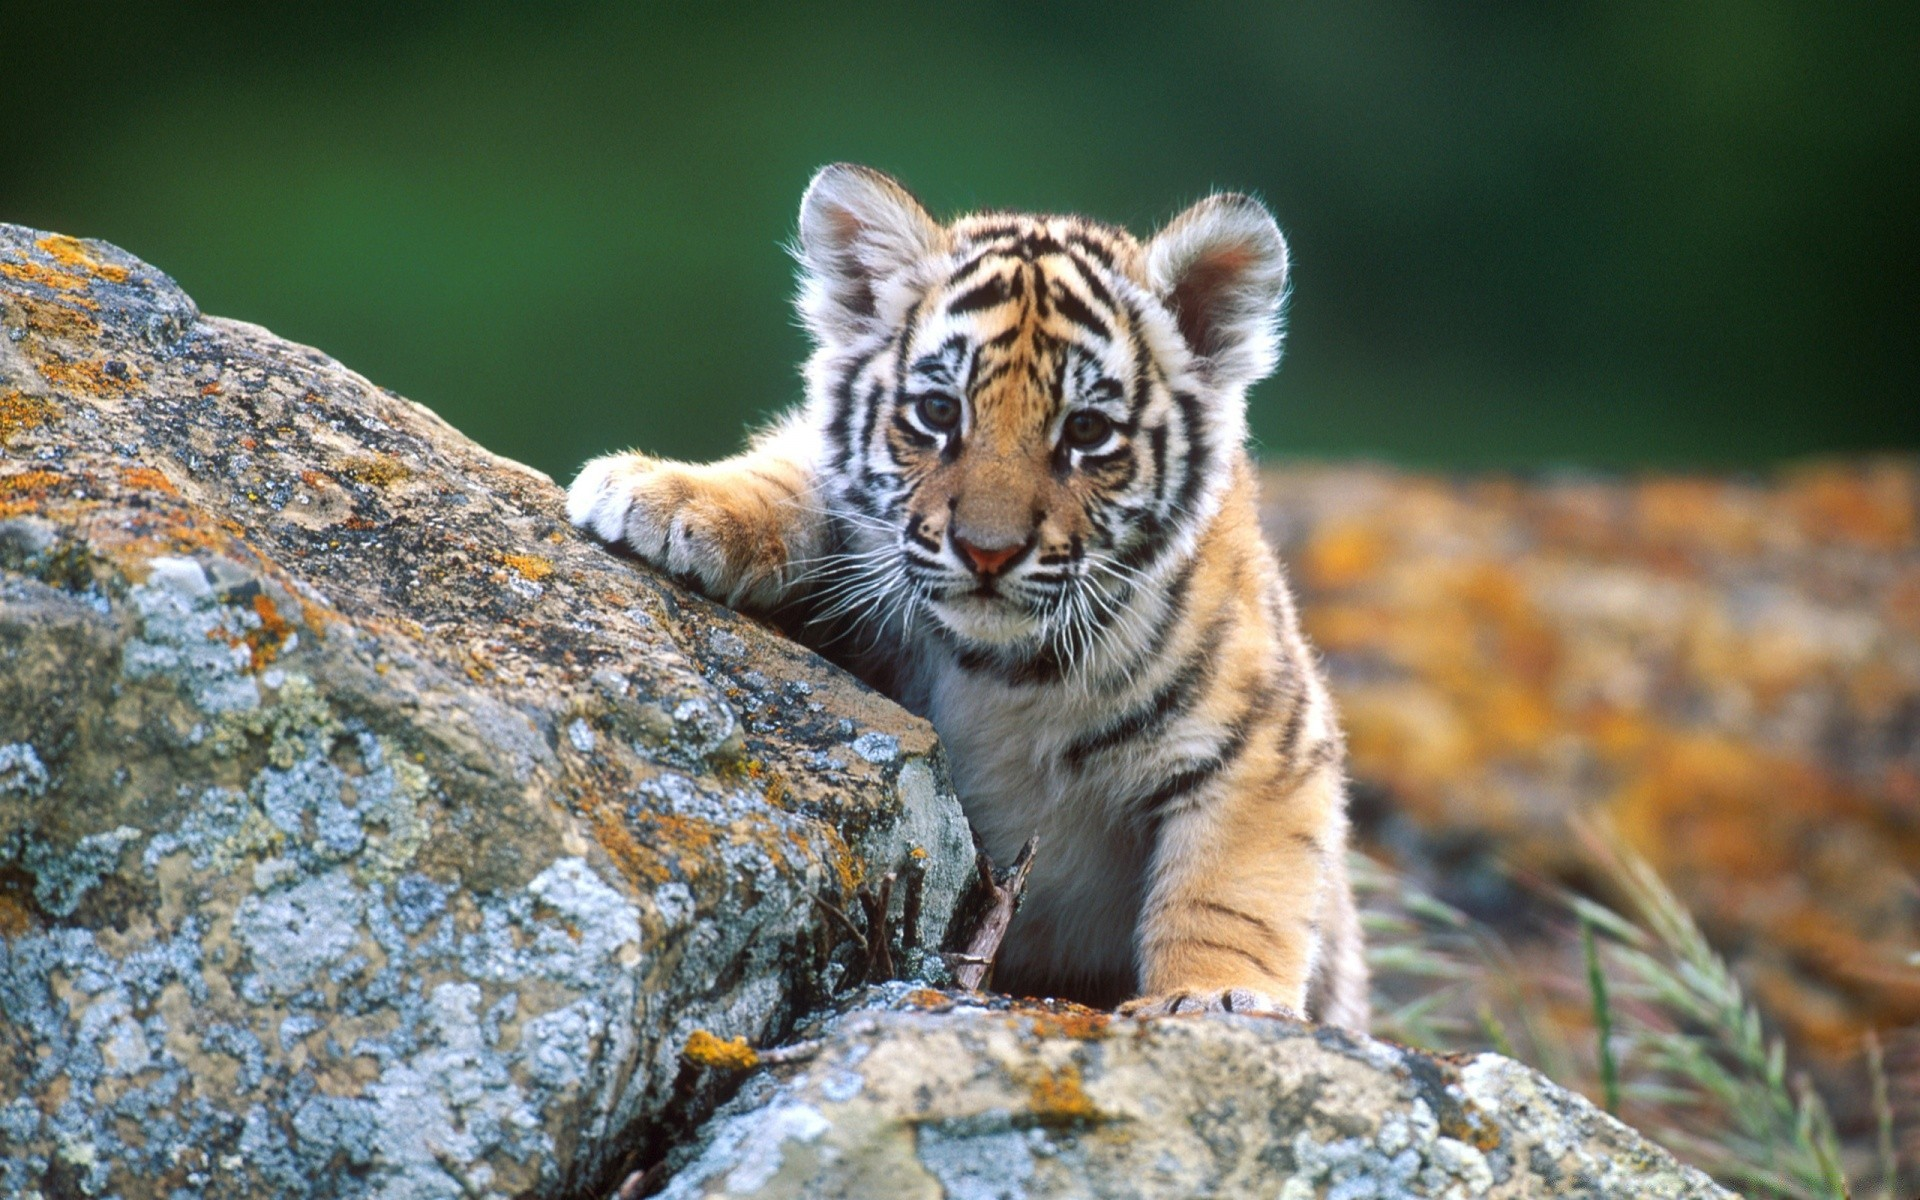 Cute Tiger Cub Desktop Wallpapers For Free